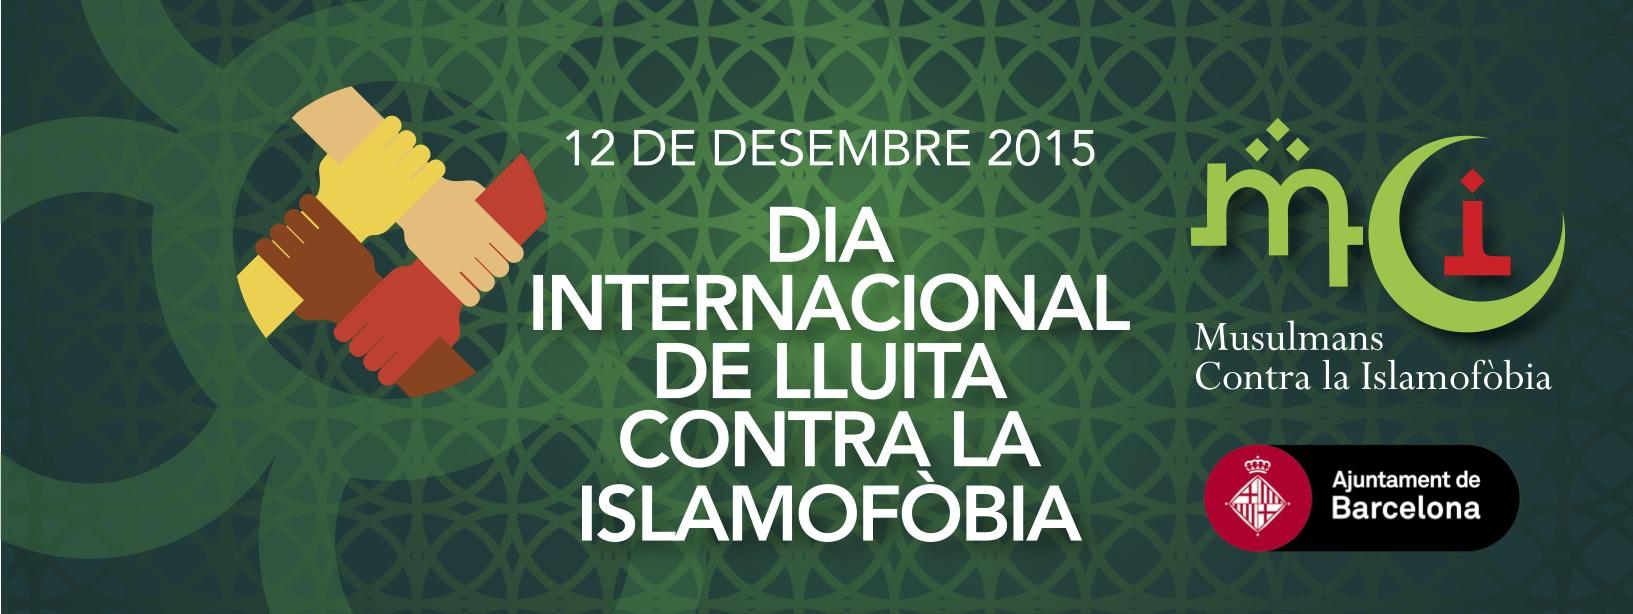 Jornada Internacional de Lluita contra la Islamofòbia